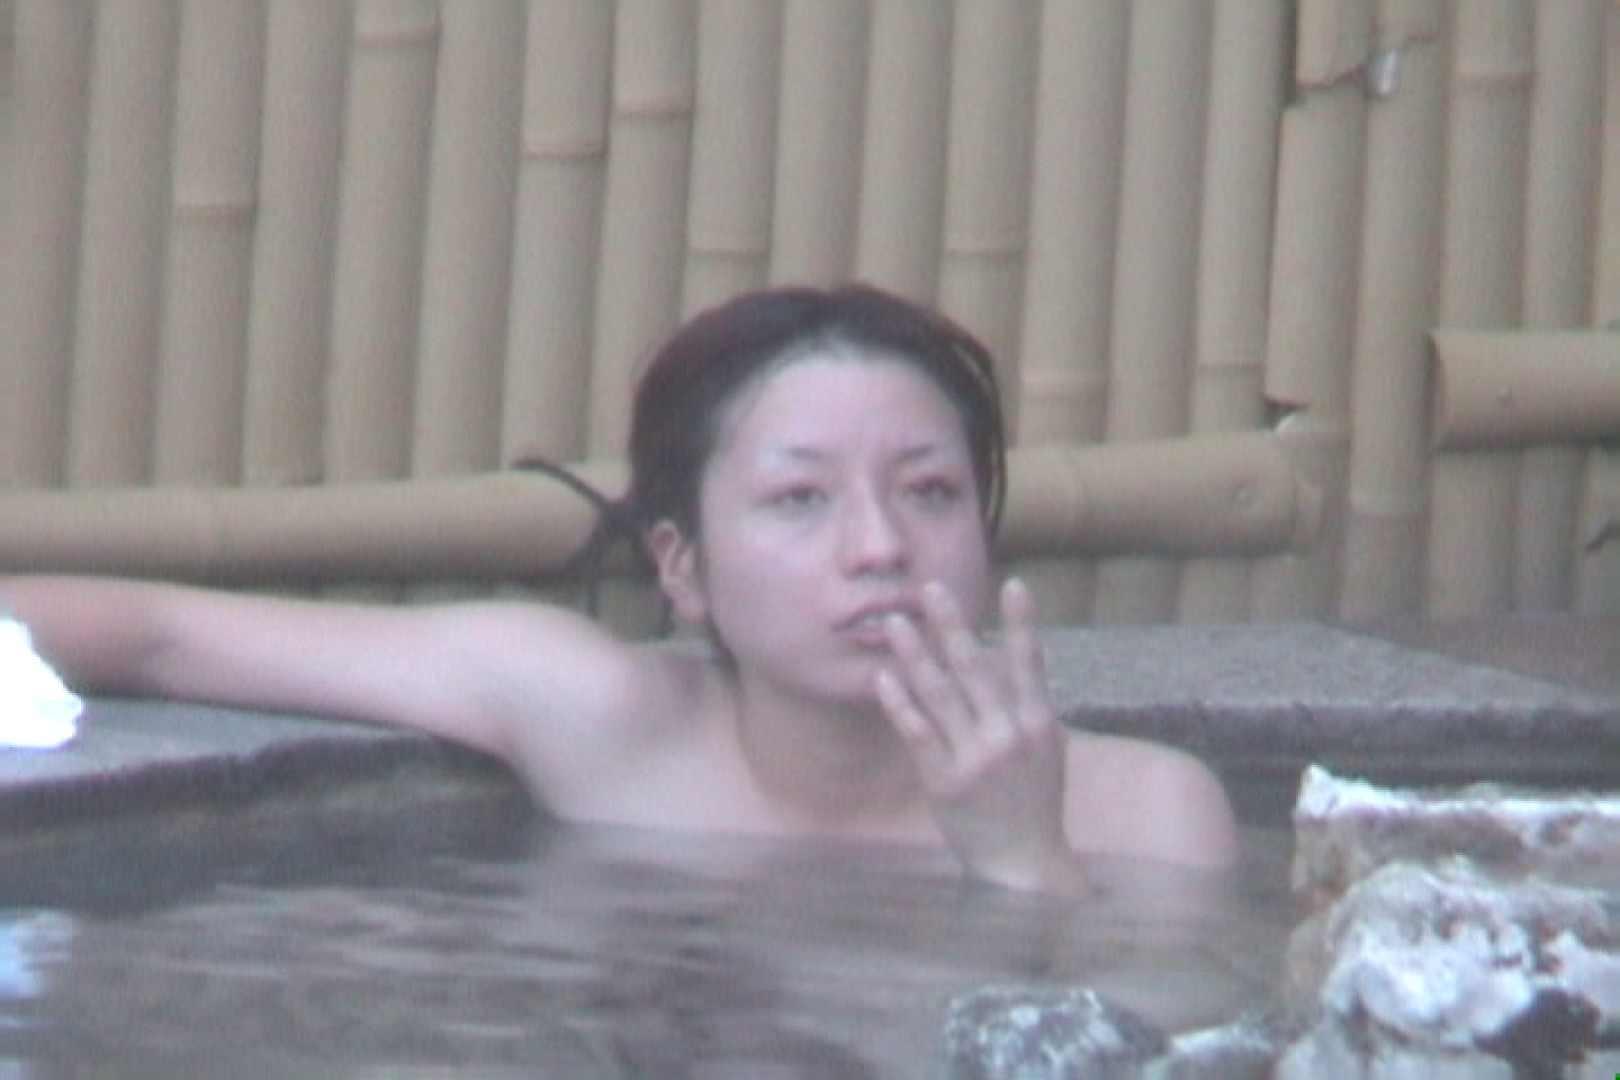 Aquaな露天風呂Vol.608 美しいOLの裸体 AV動画キャプチャ 95pic 74